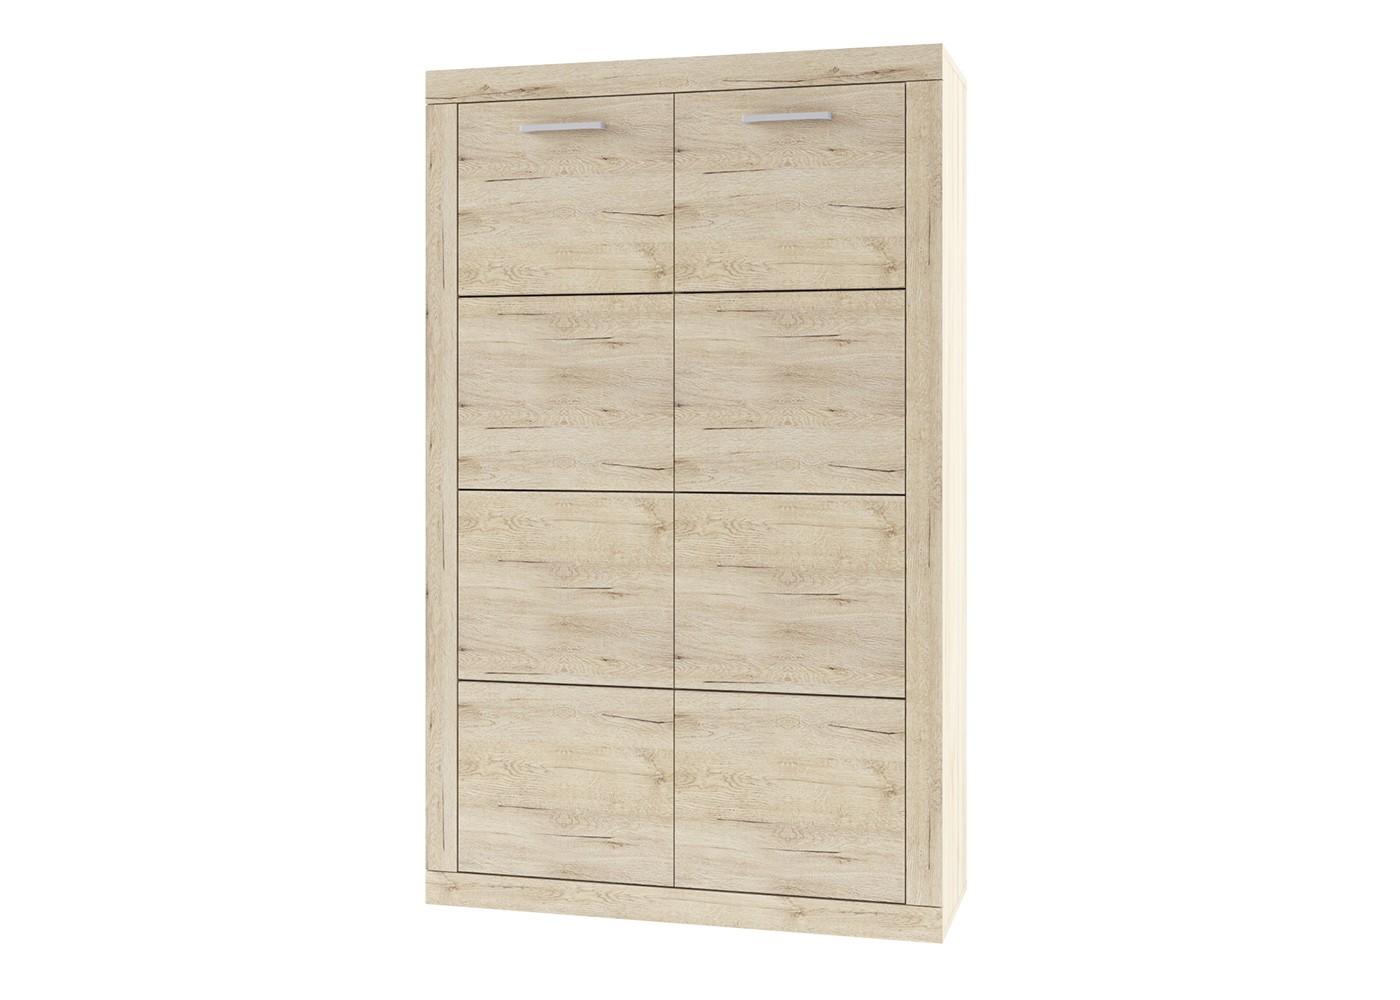 Шкаф OscarБельевые шкафы<br><br><br>Material: ДСП<br>Ширина см: 92<br>Высота см: 149<br>Глубина см: 35